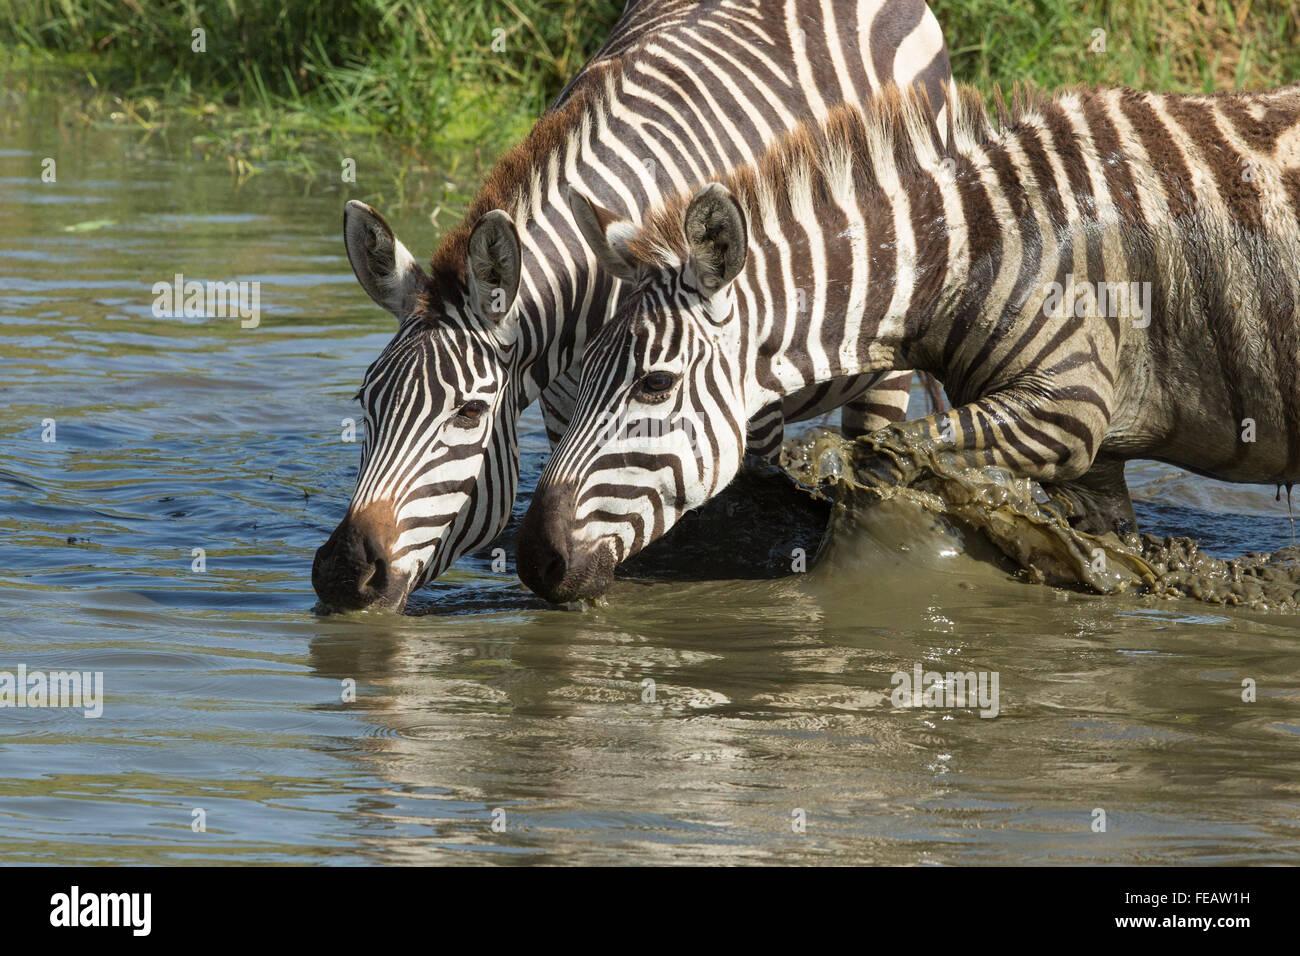 Zwei Erwachsene Plains Zebra trinken in der Serengeti-Nationalpark Tansania Stockbild